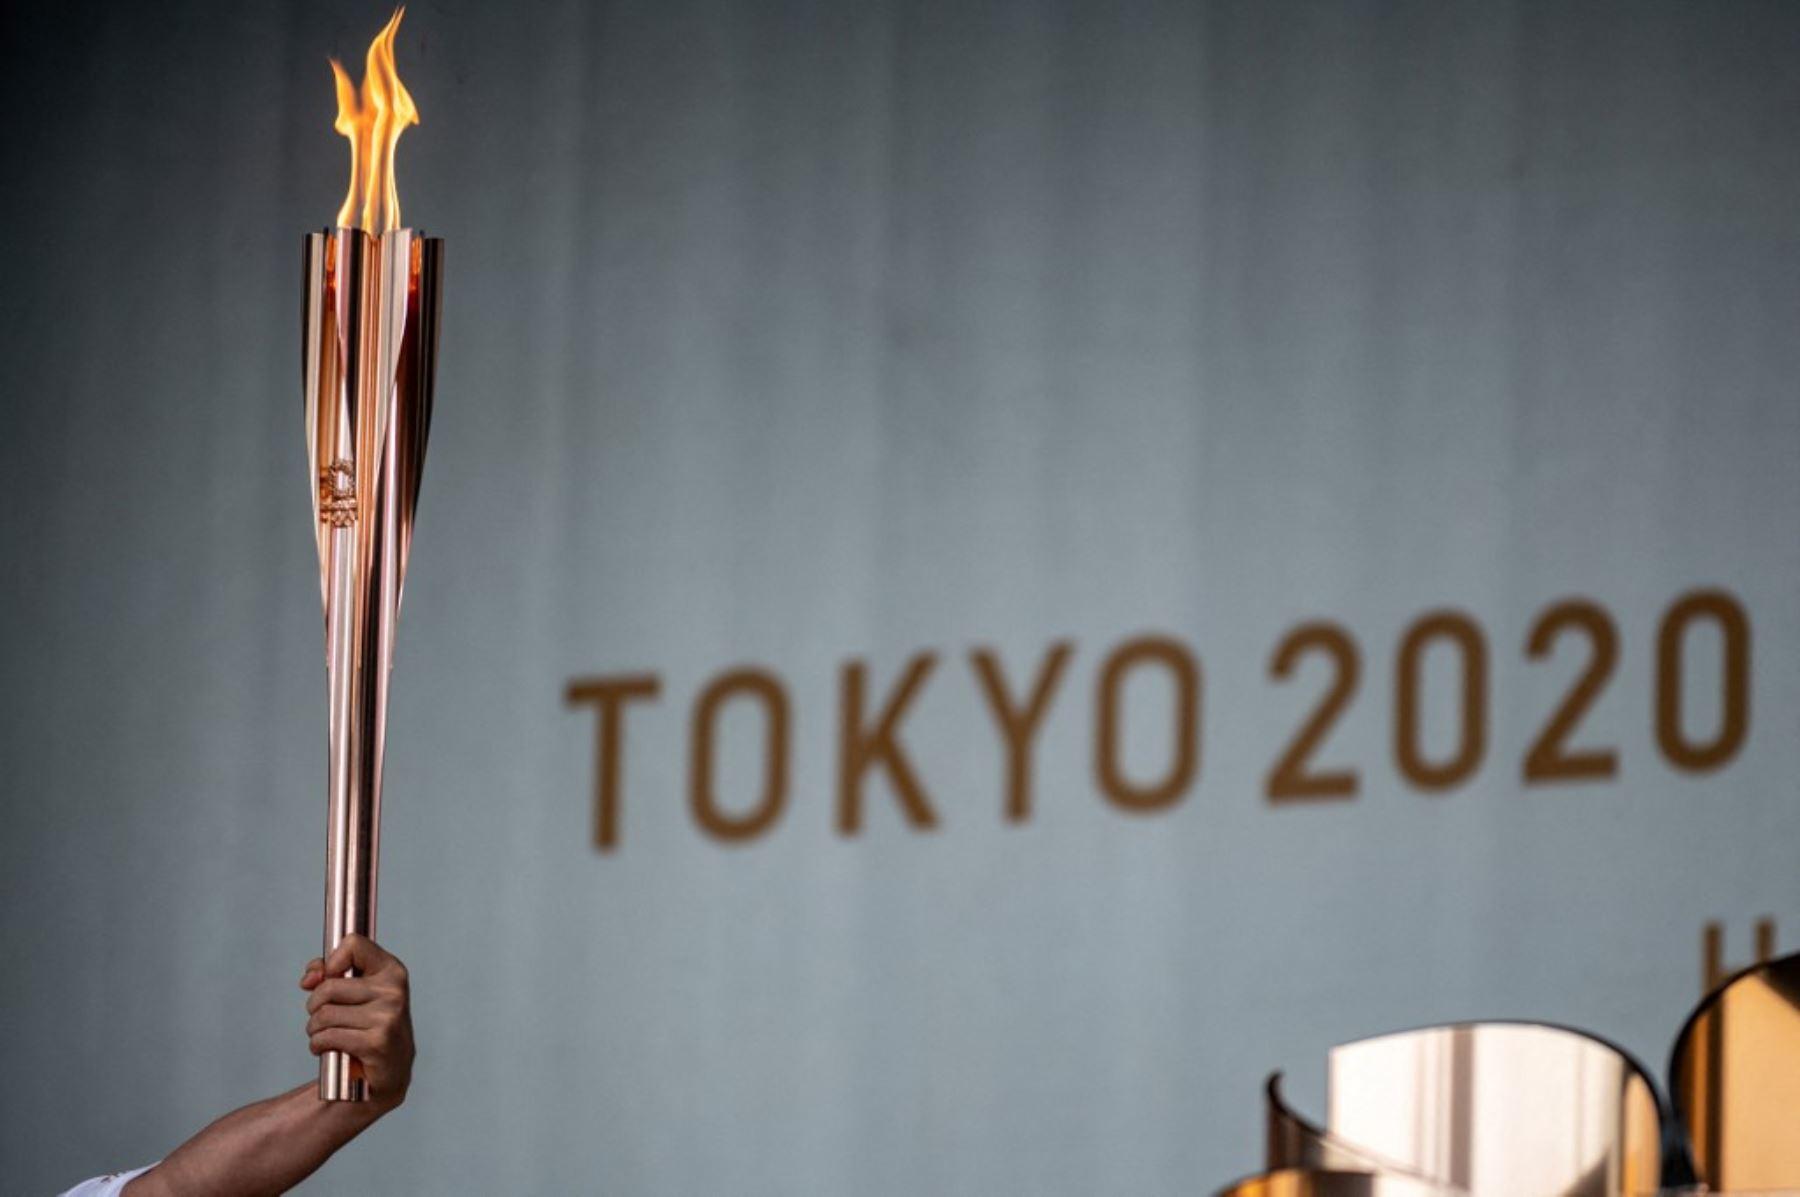 Juegos de Tokio: Antorcha olímpica llega a Tokio para un relevo sin espectadores